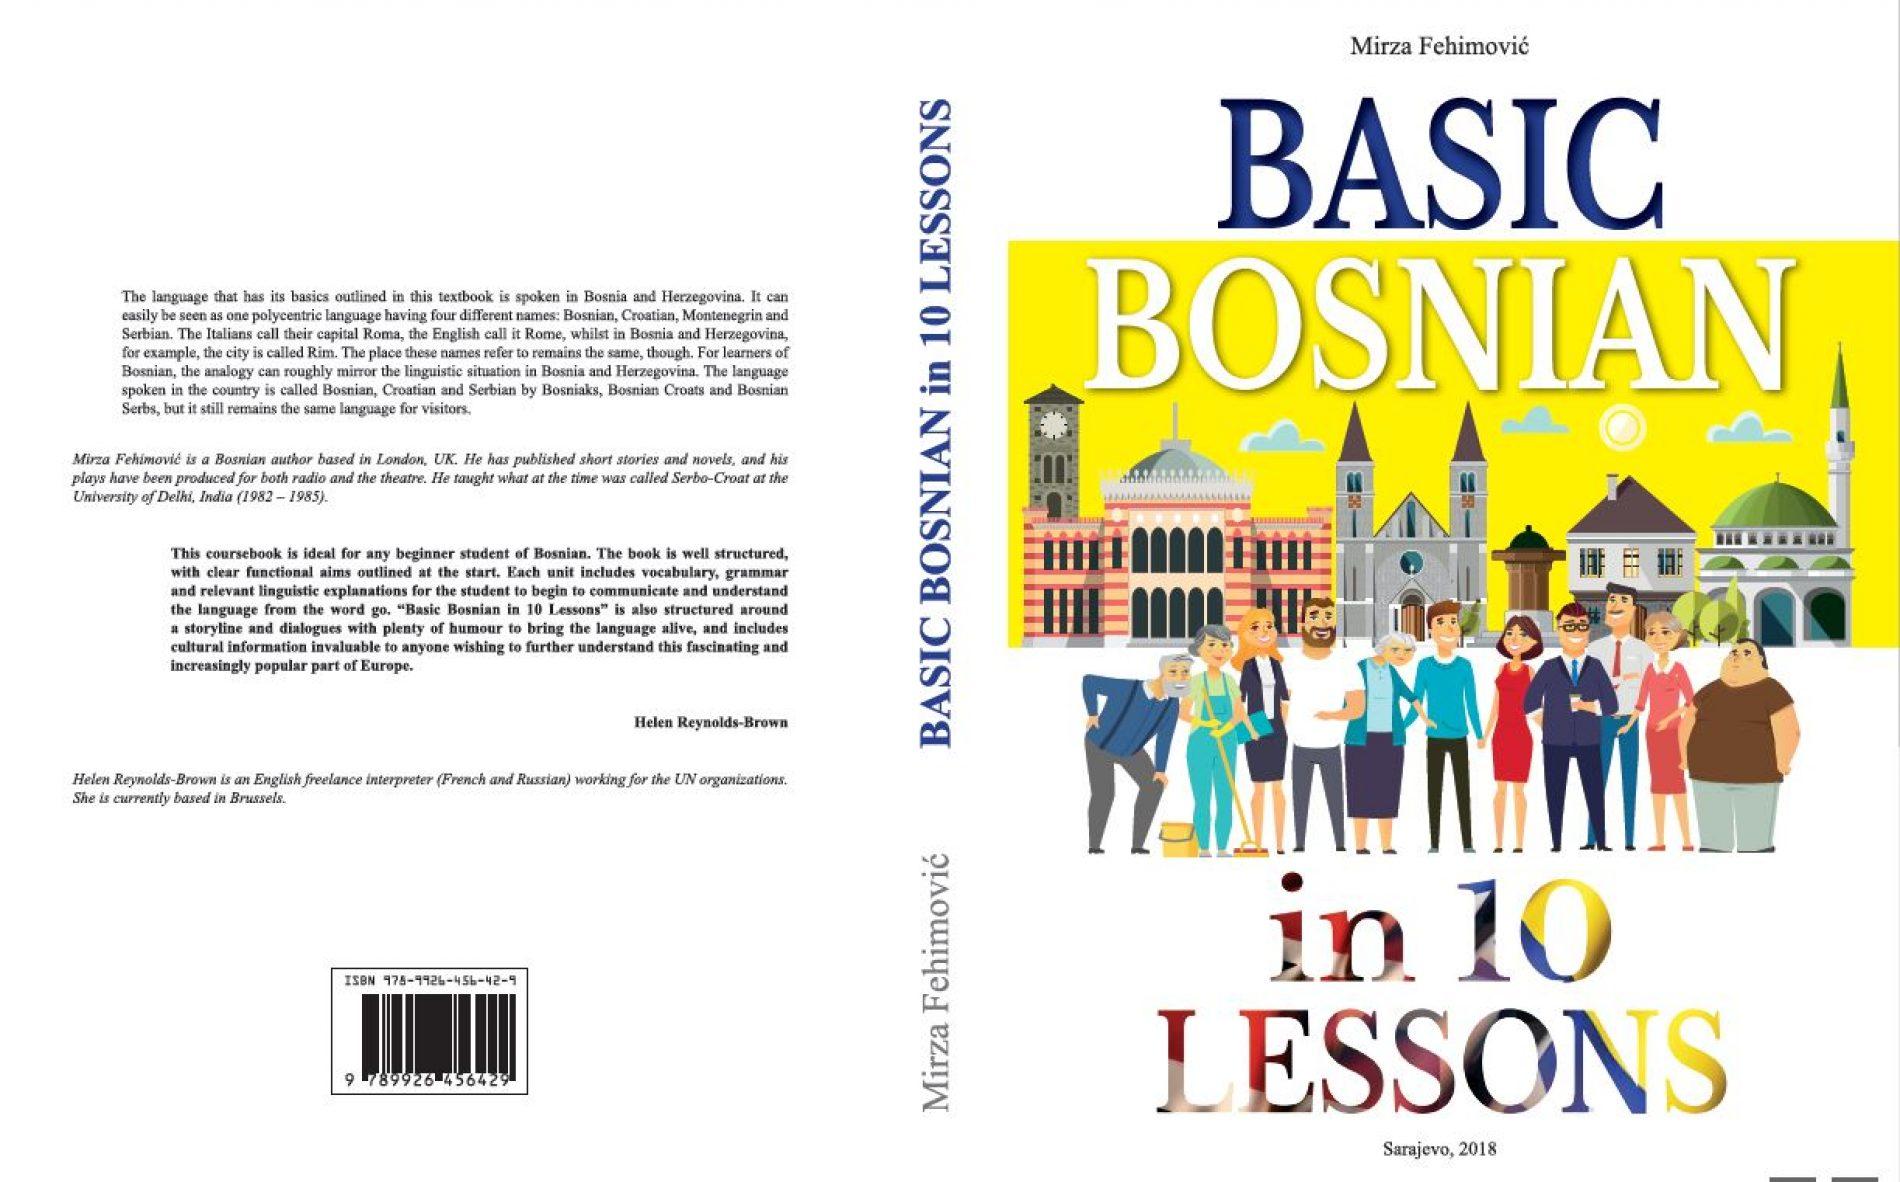 Basic Bosnian in 10 Lessons: Udžbenik bosanskog jezika za strance